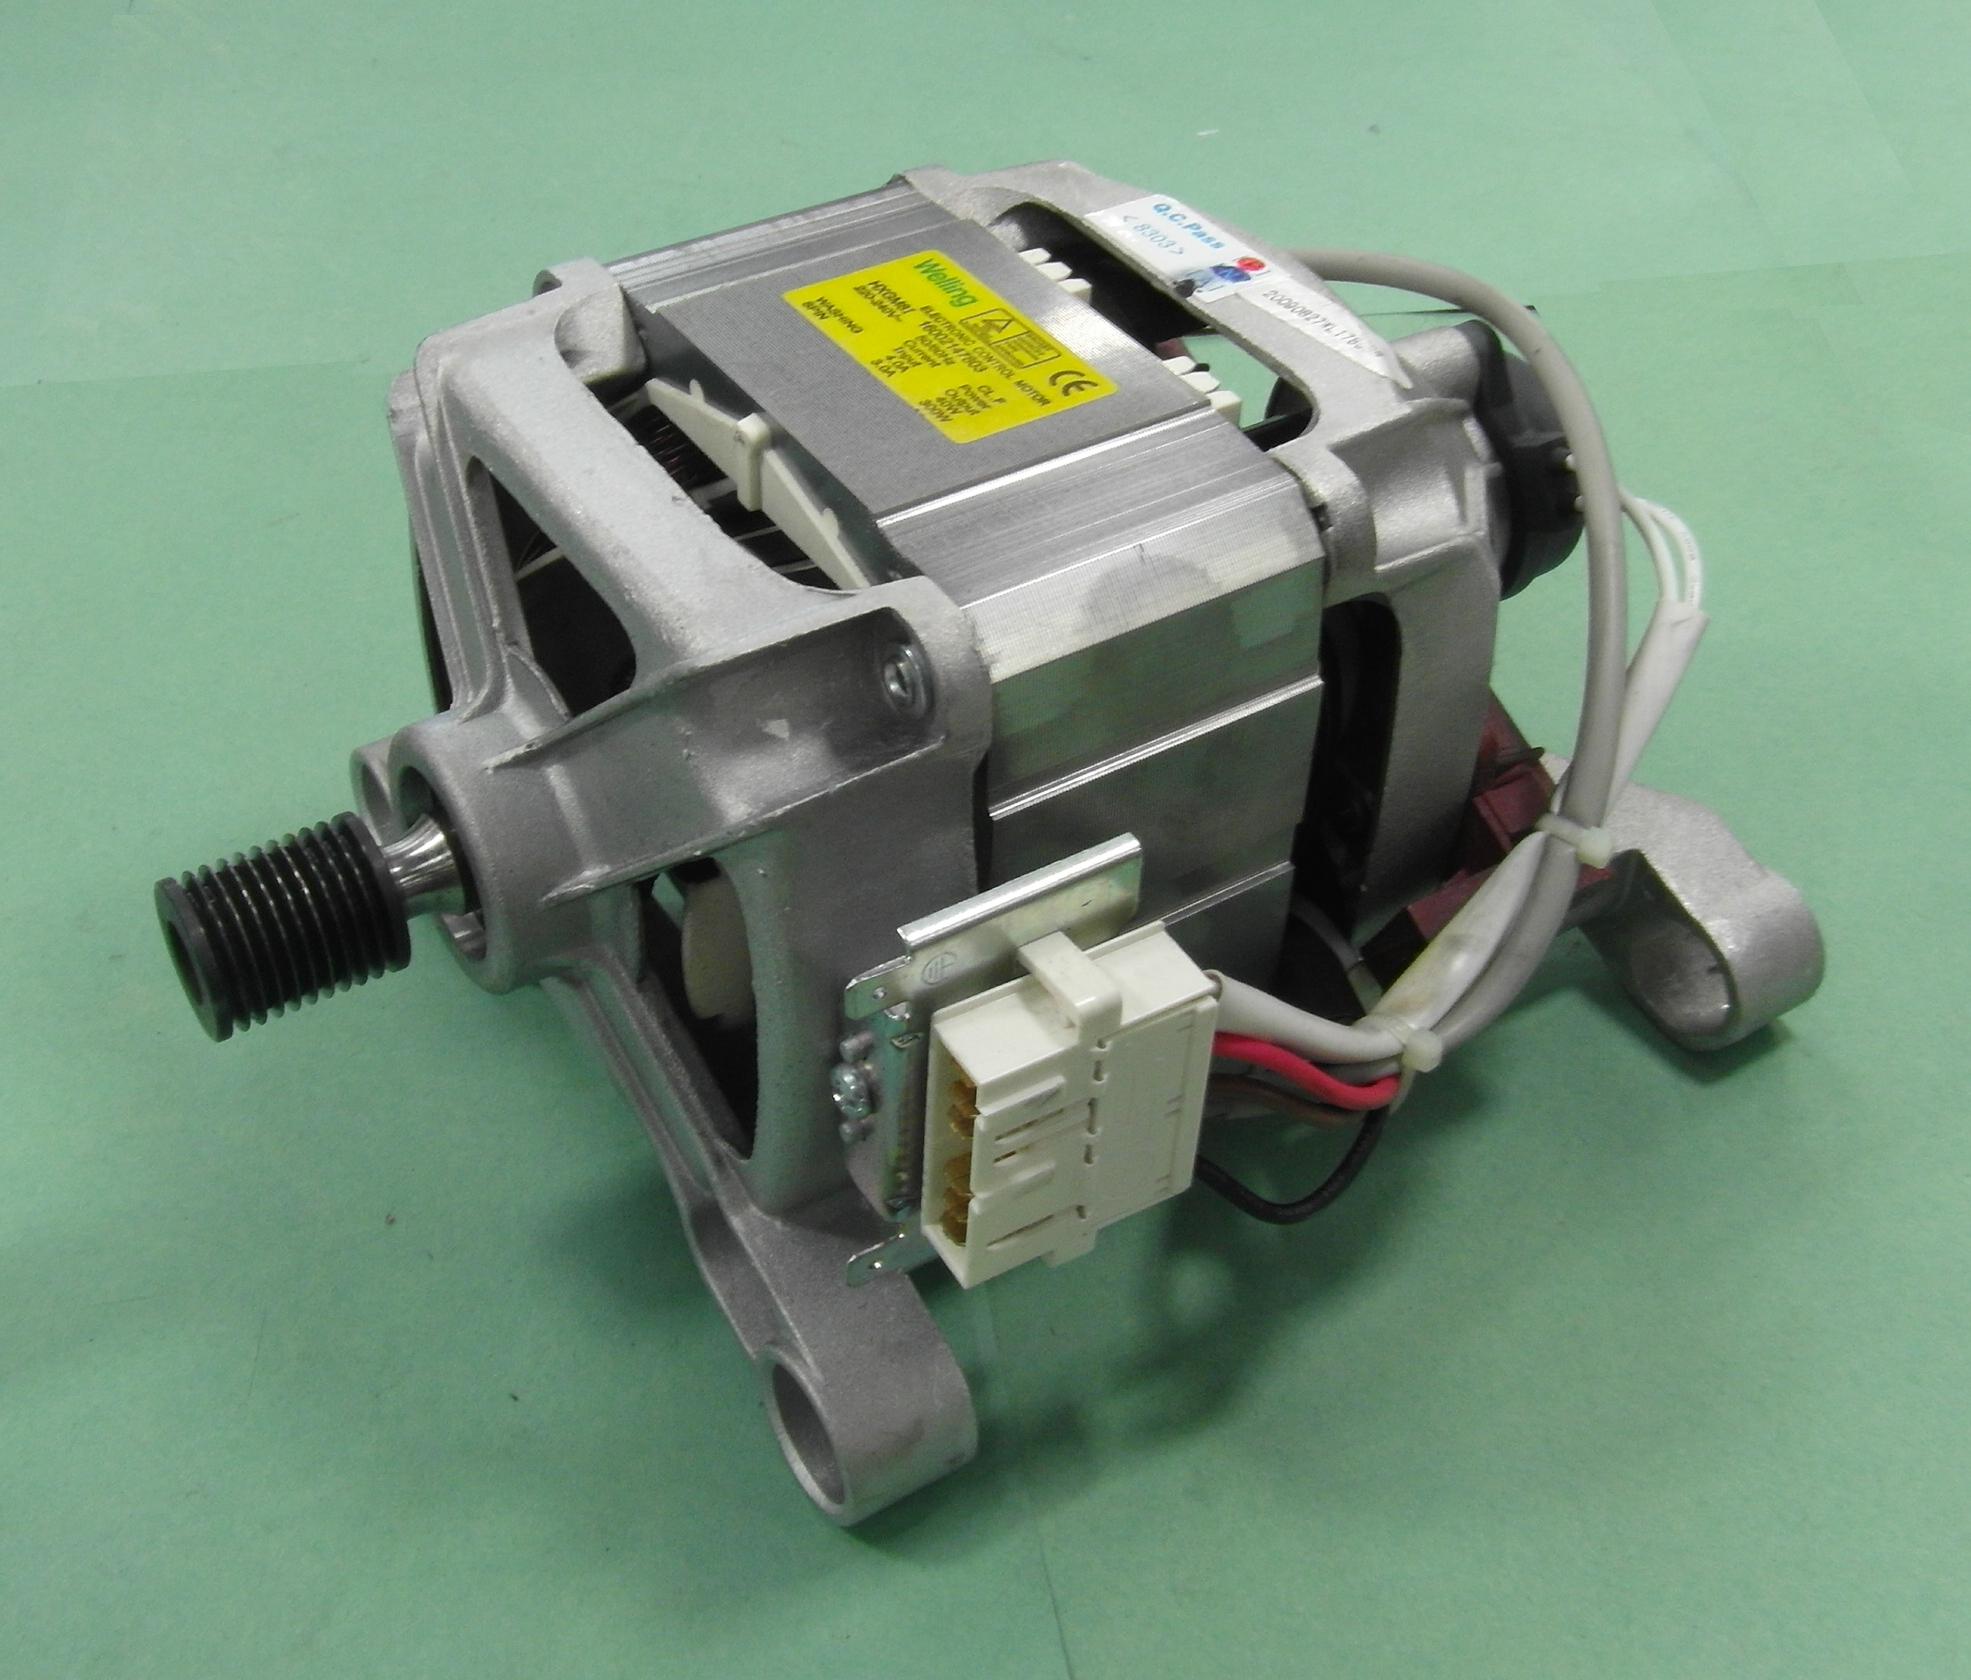 Hotpoint Wdl520g Uk C Washer Dryer Motor Welling Hxgm8i